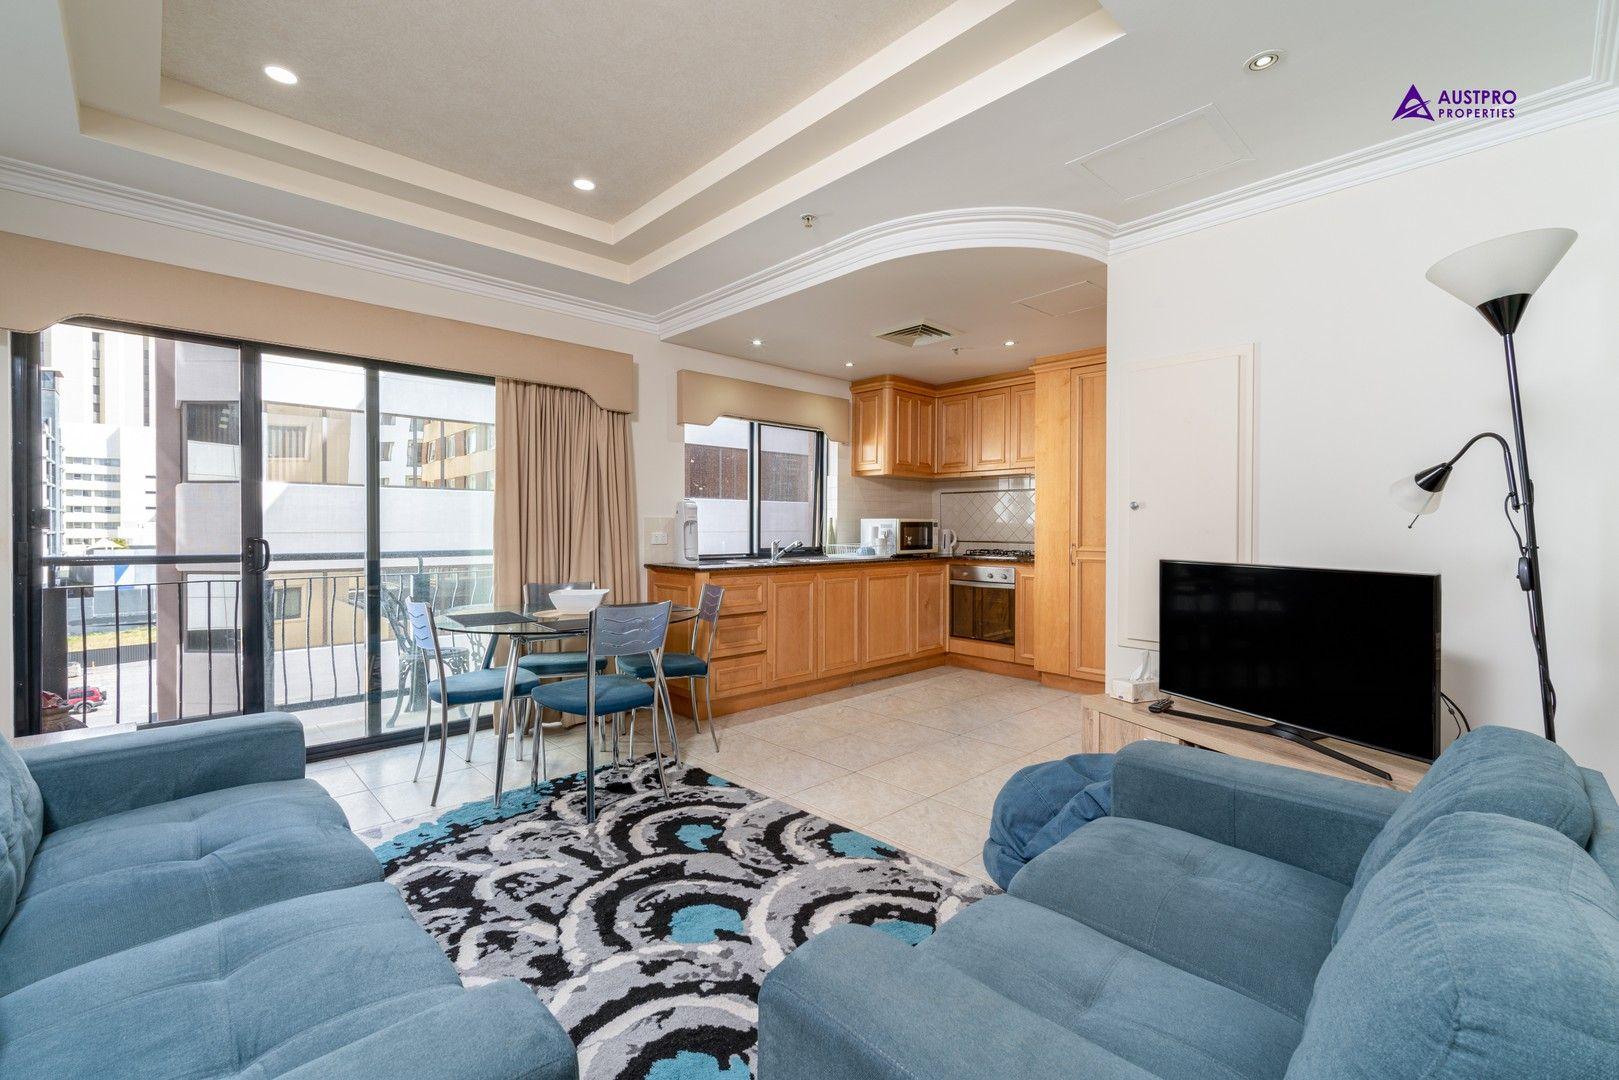 1 bedrooms Apartment / Unit / Flat in Unit 505/9 Victoria Avenue PERTH WA, 6000